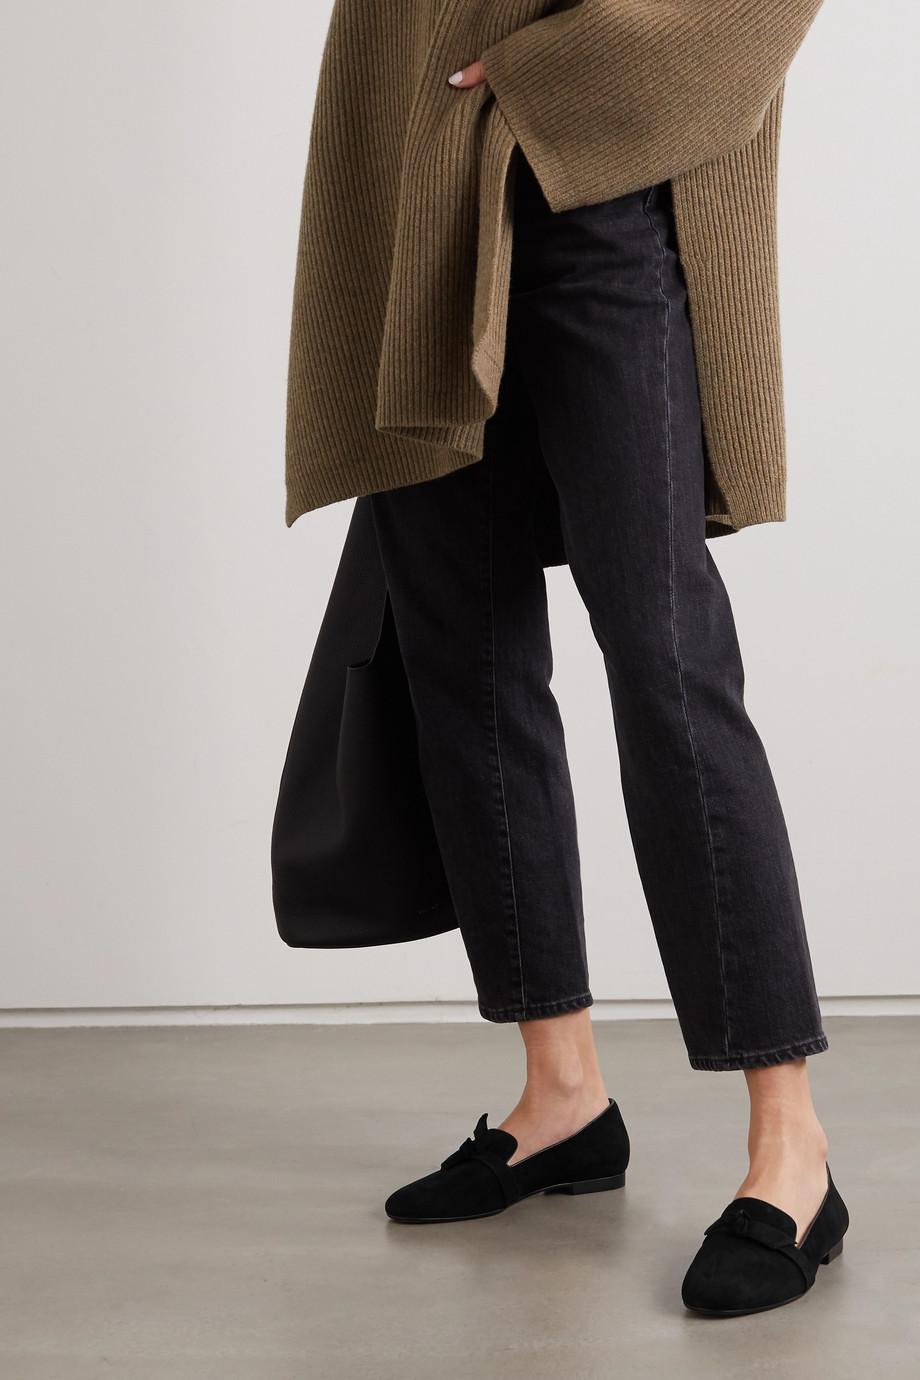 Alexandre Birman Clarita bow-embellished suede loafers